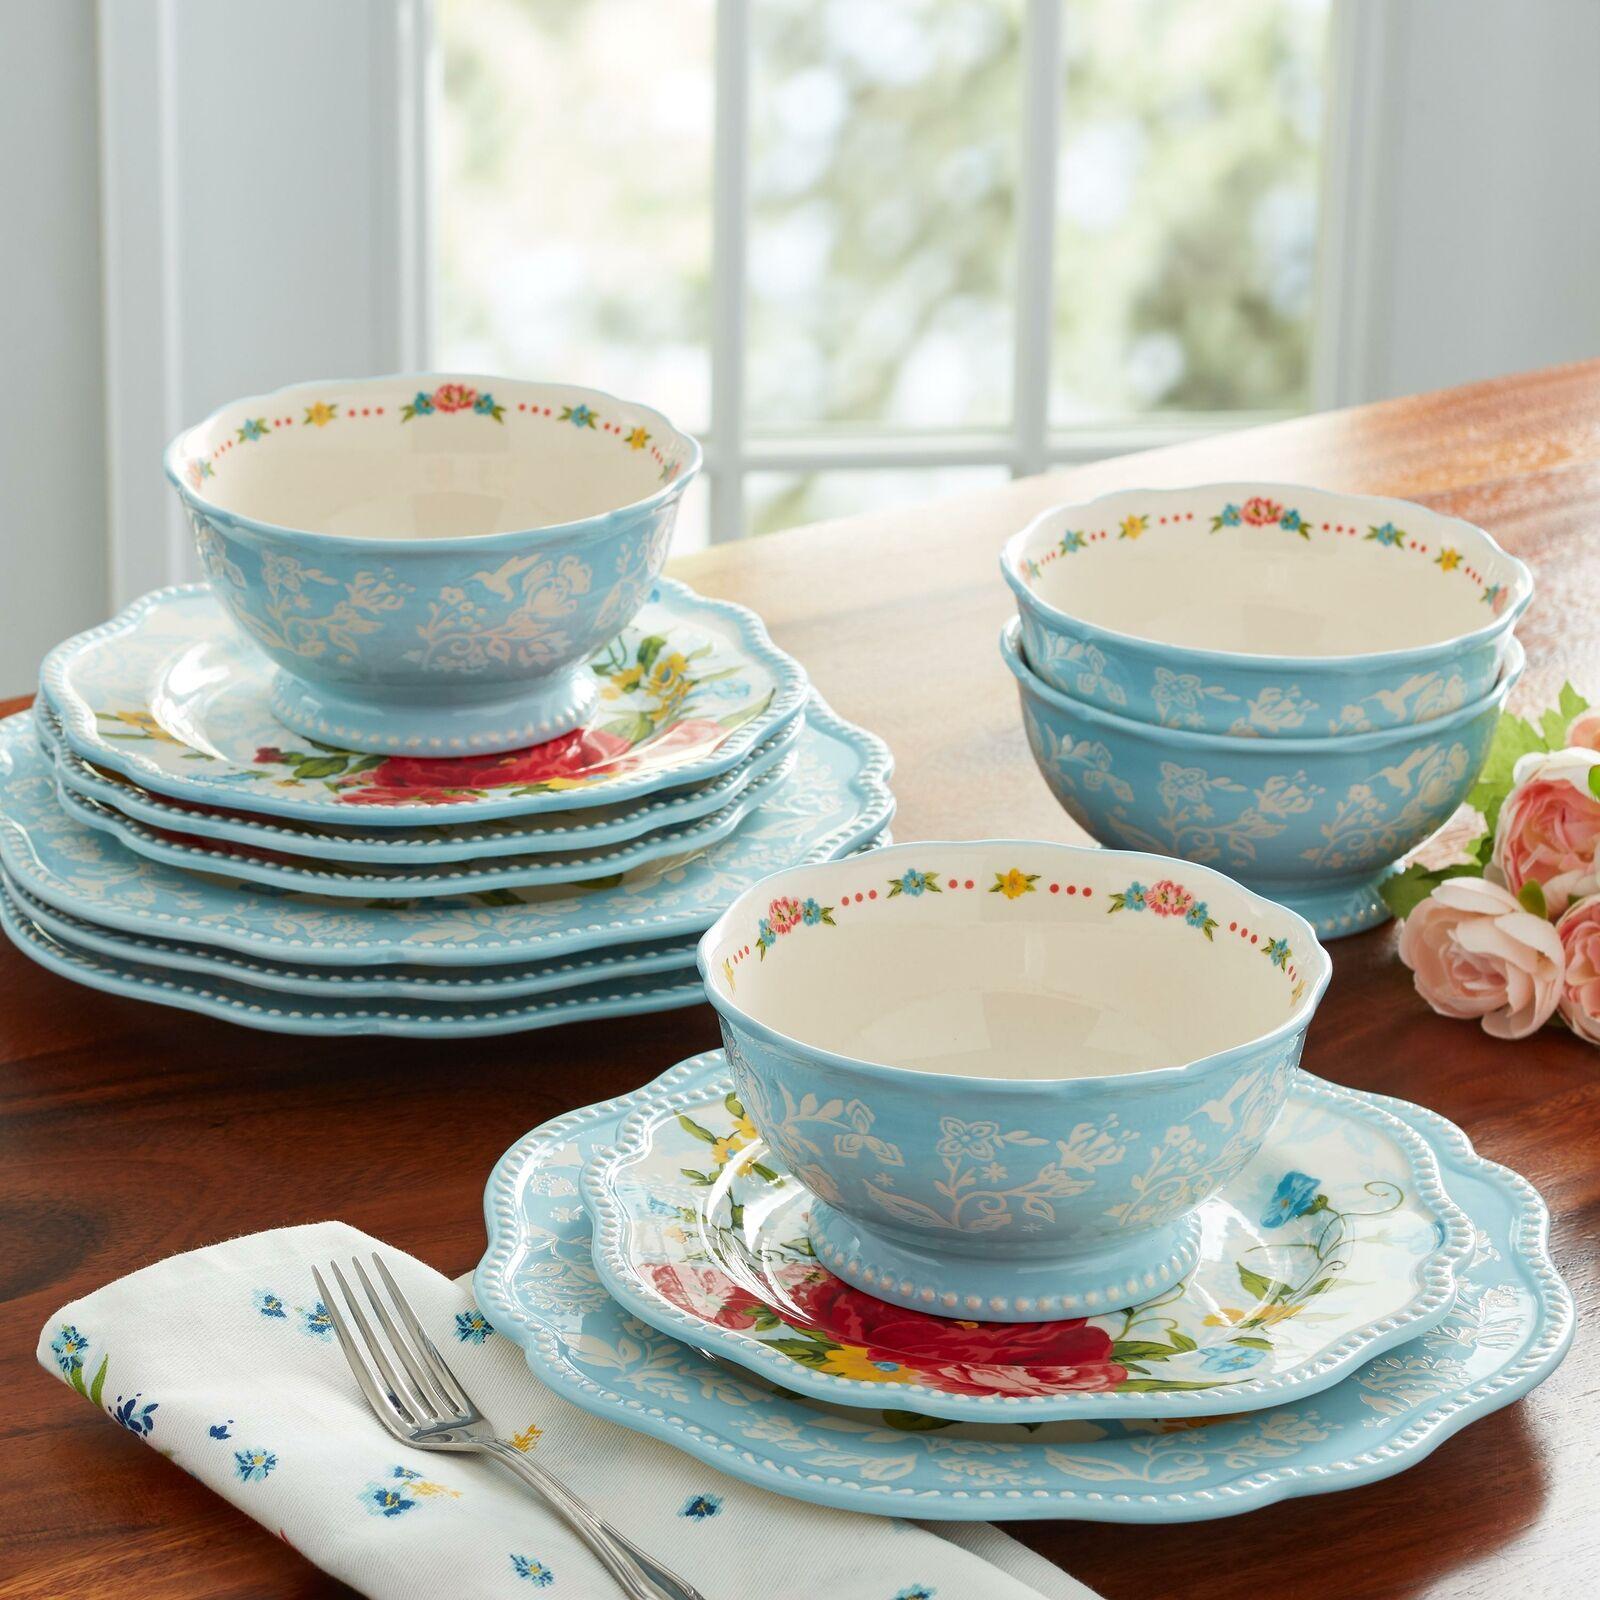 The Pioneer Woman Winter Bouquet 12 Piece Dinnerware Set Home Kitchen For Sale Online Ebay